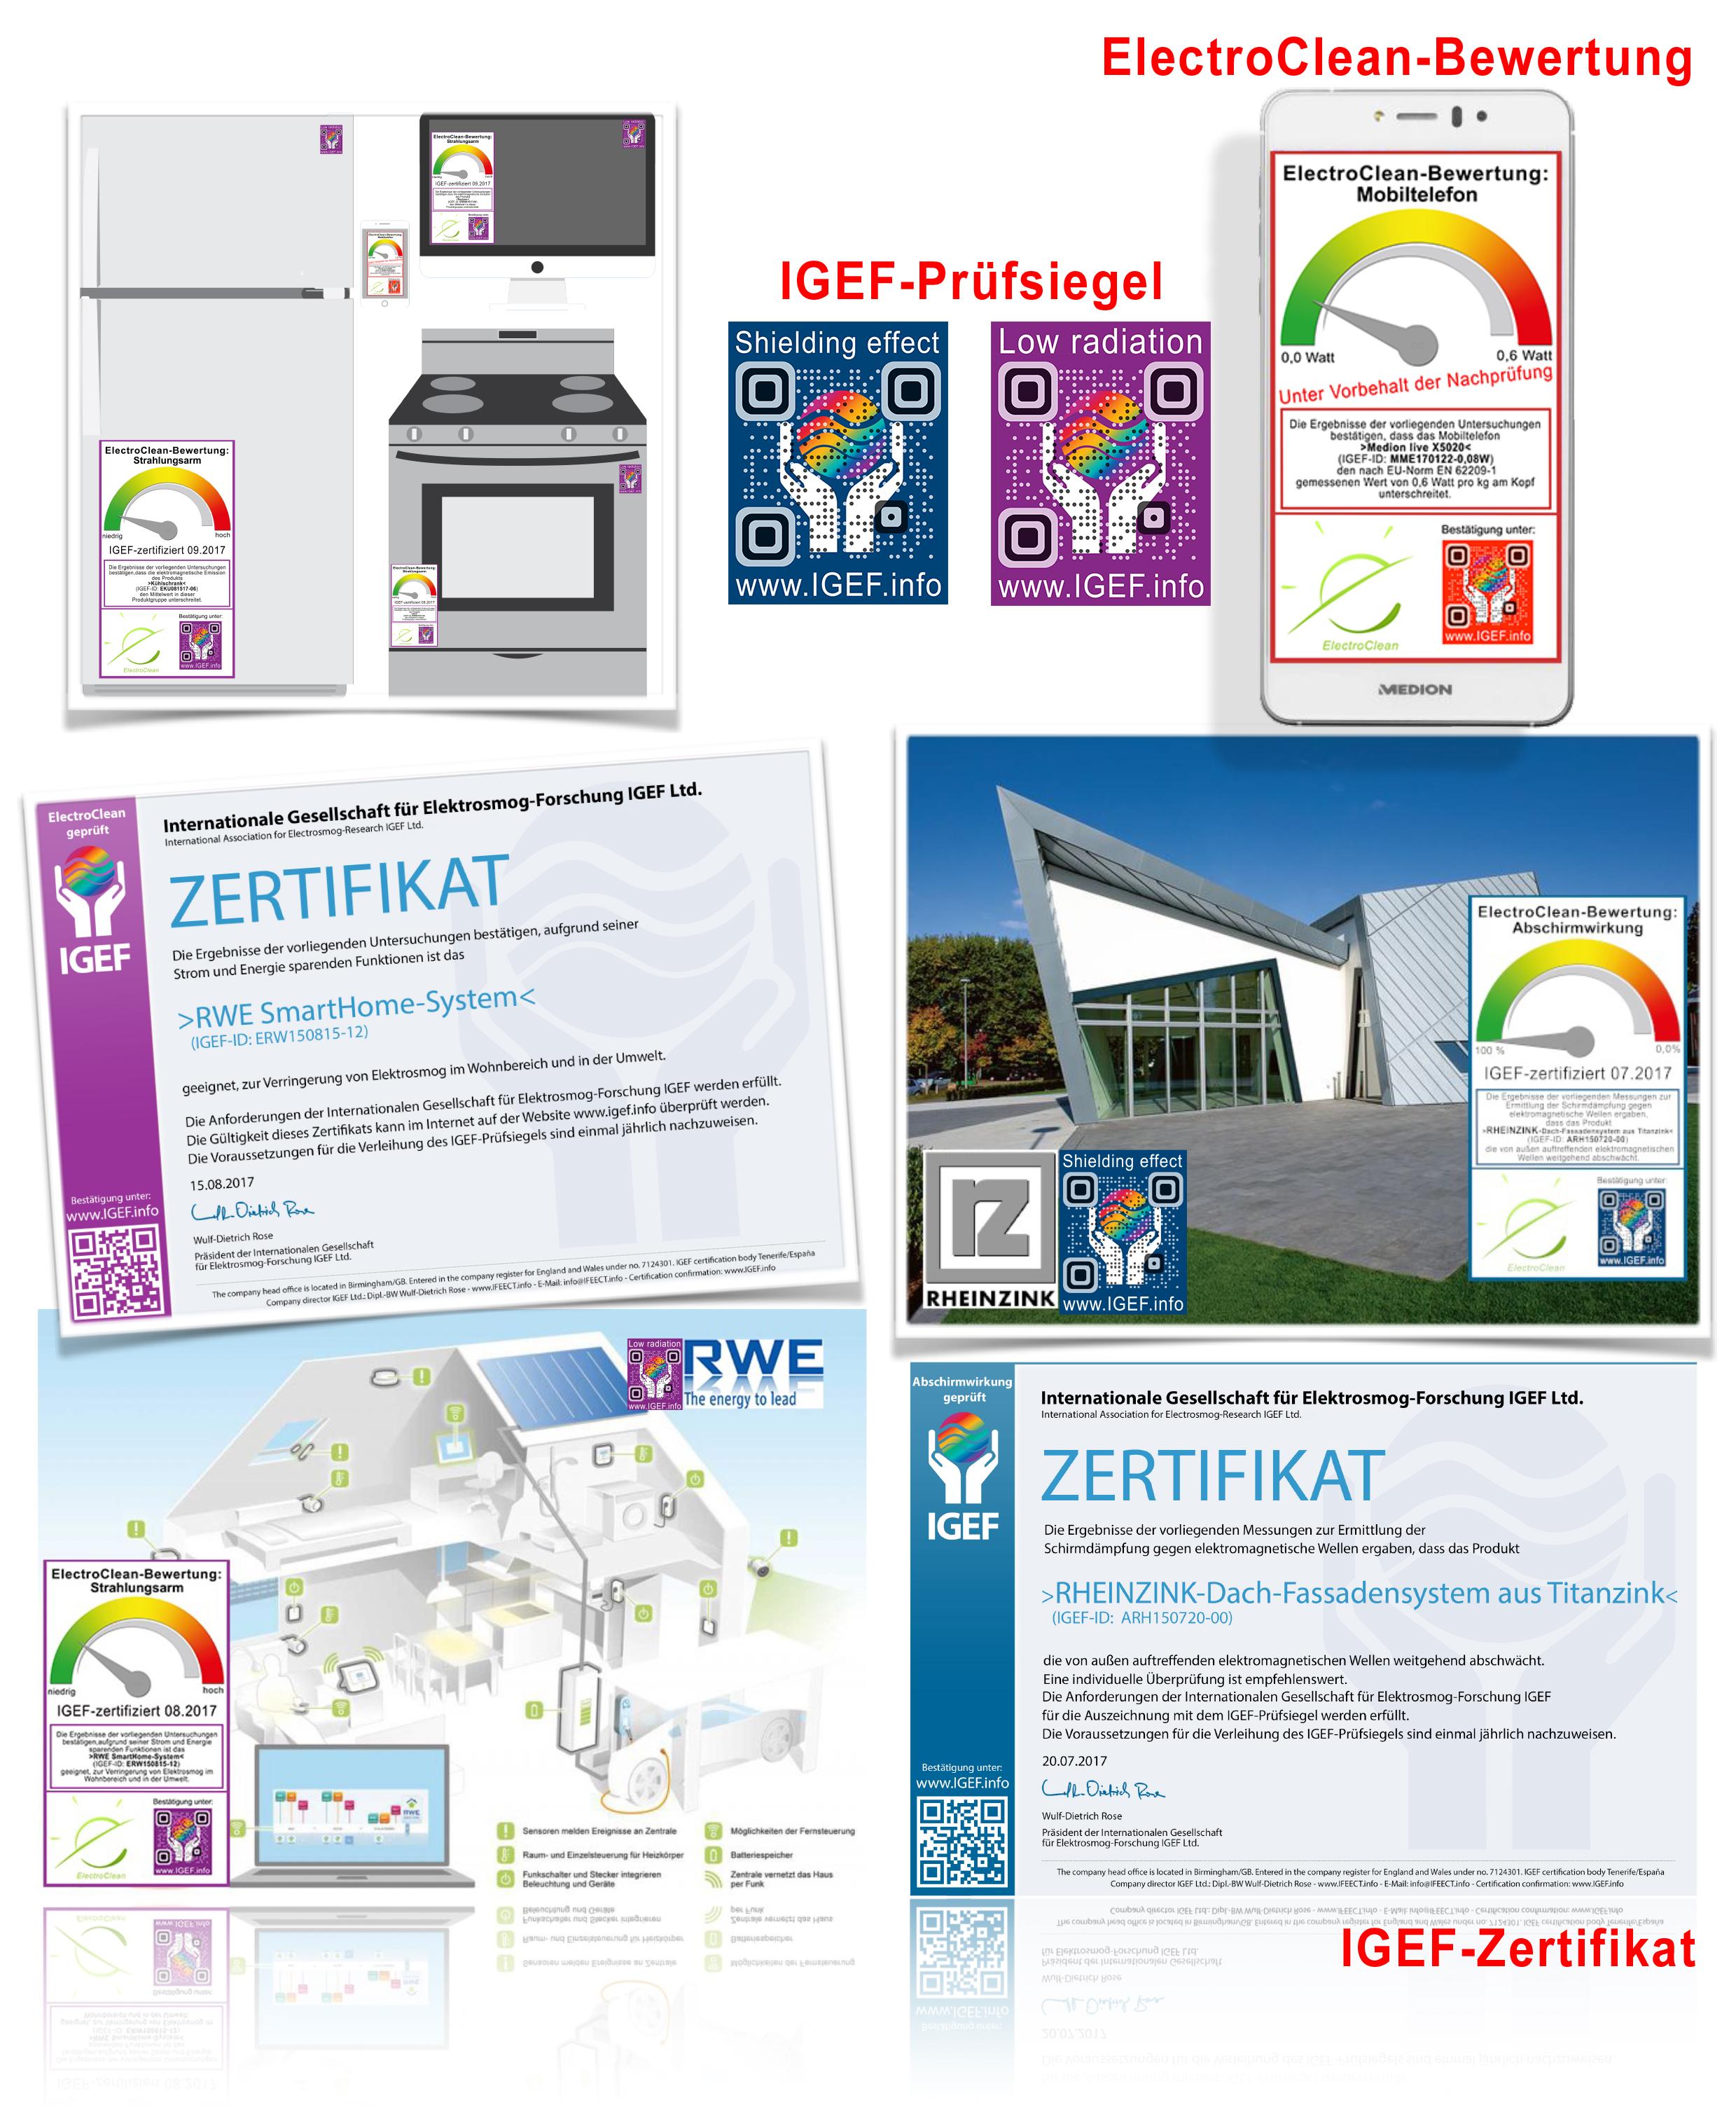 Ihre ElektroClean-Bewertung+zertifikat3.pages